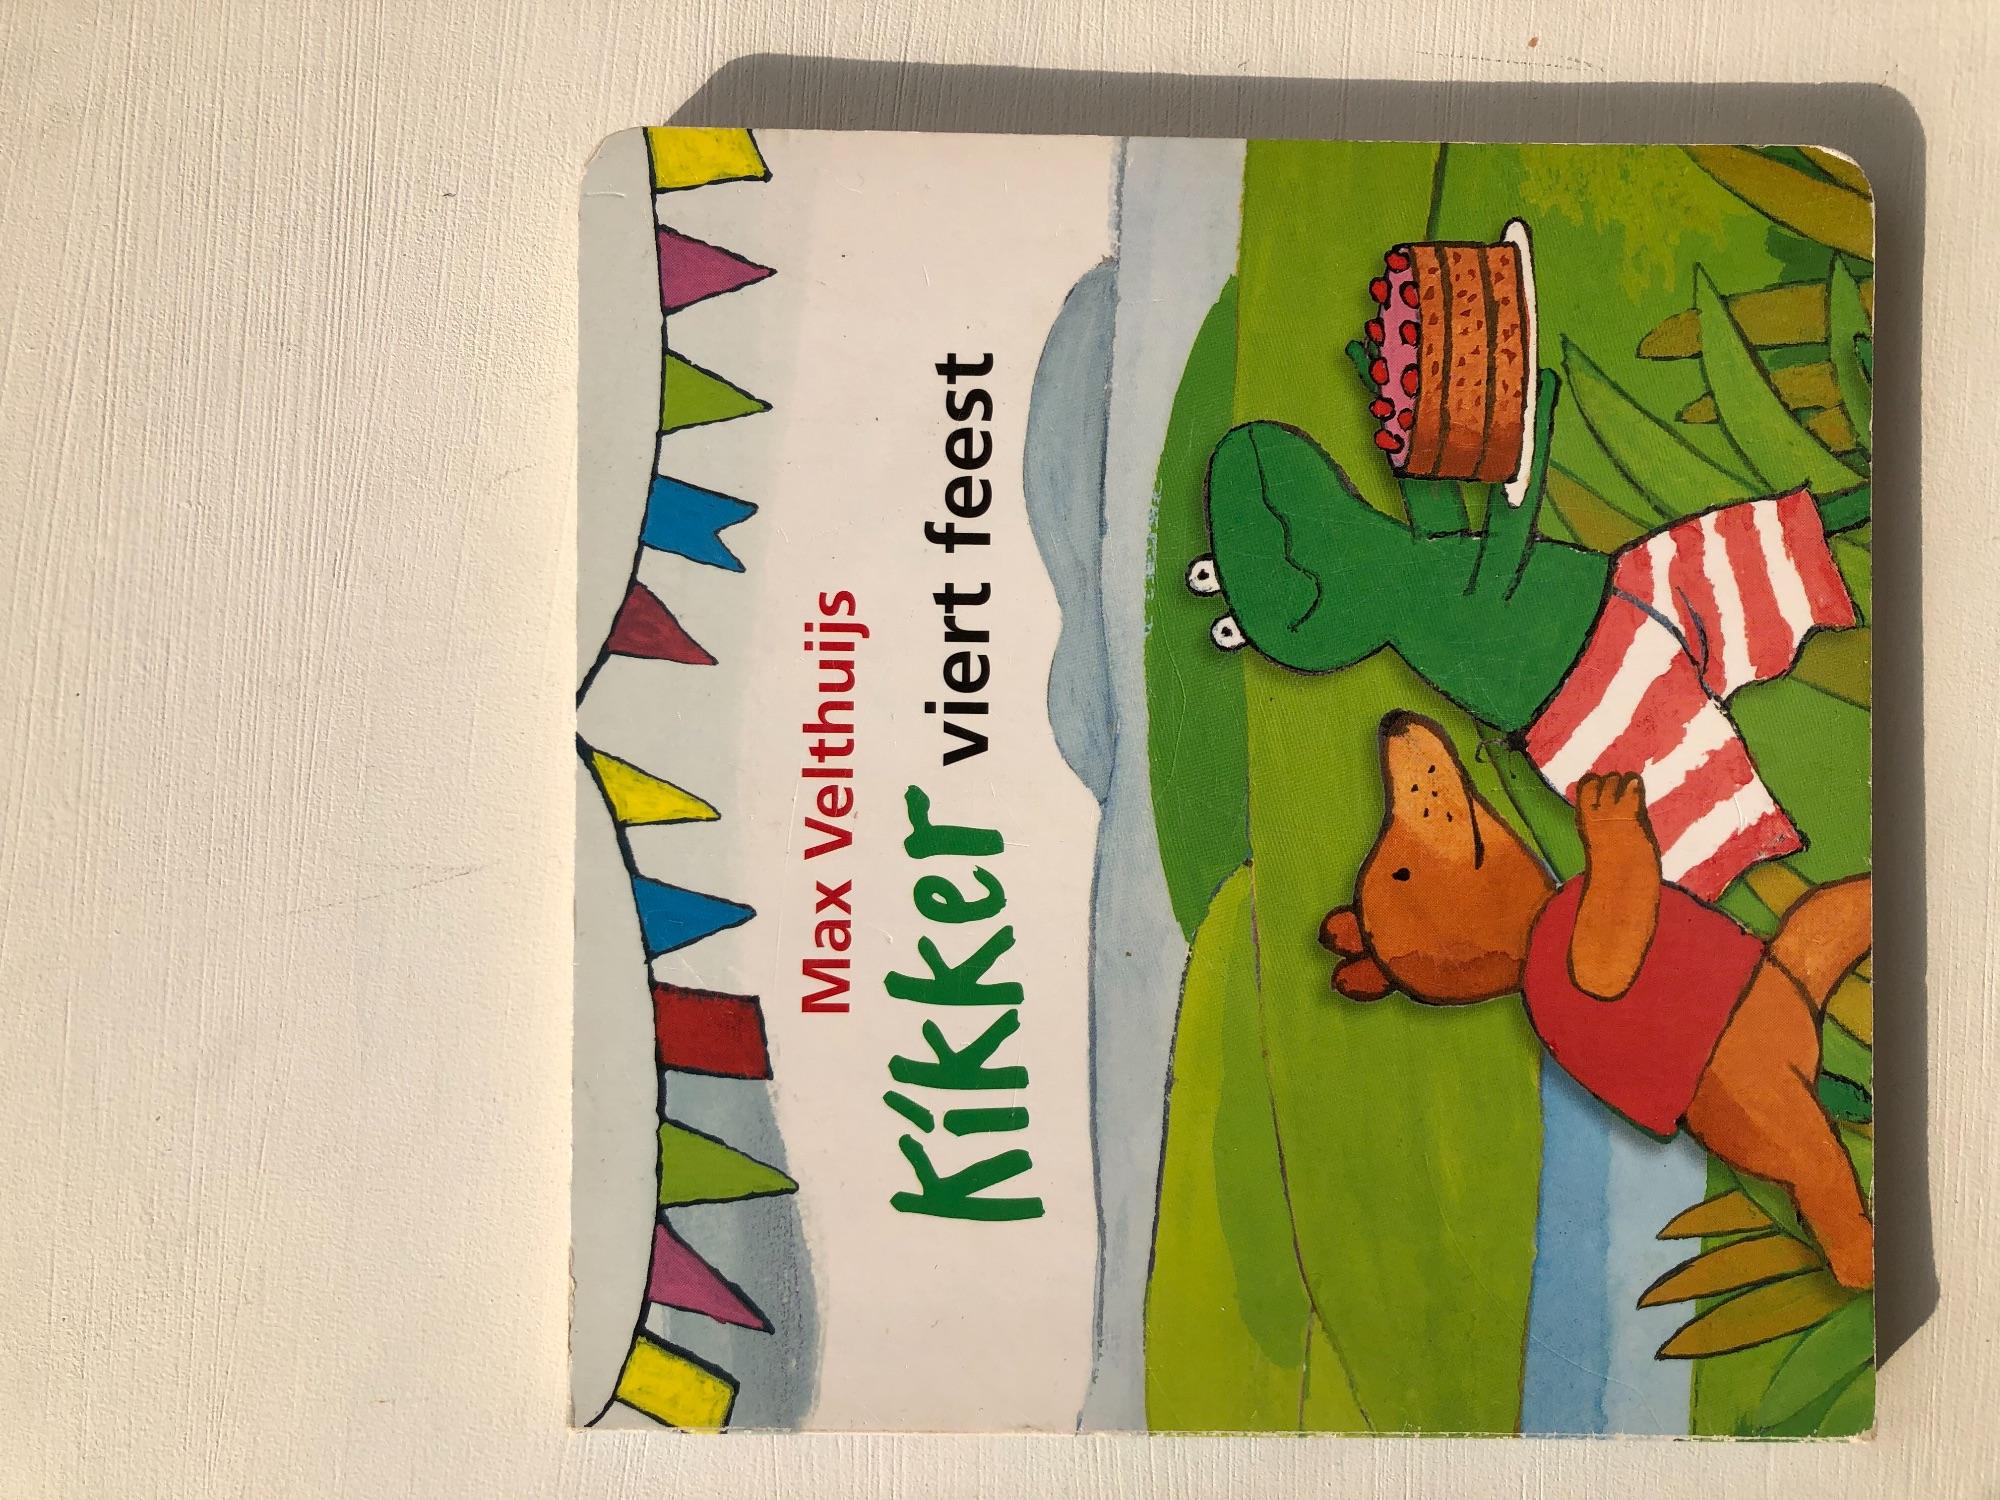 Boek Kikker viert feest